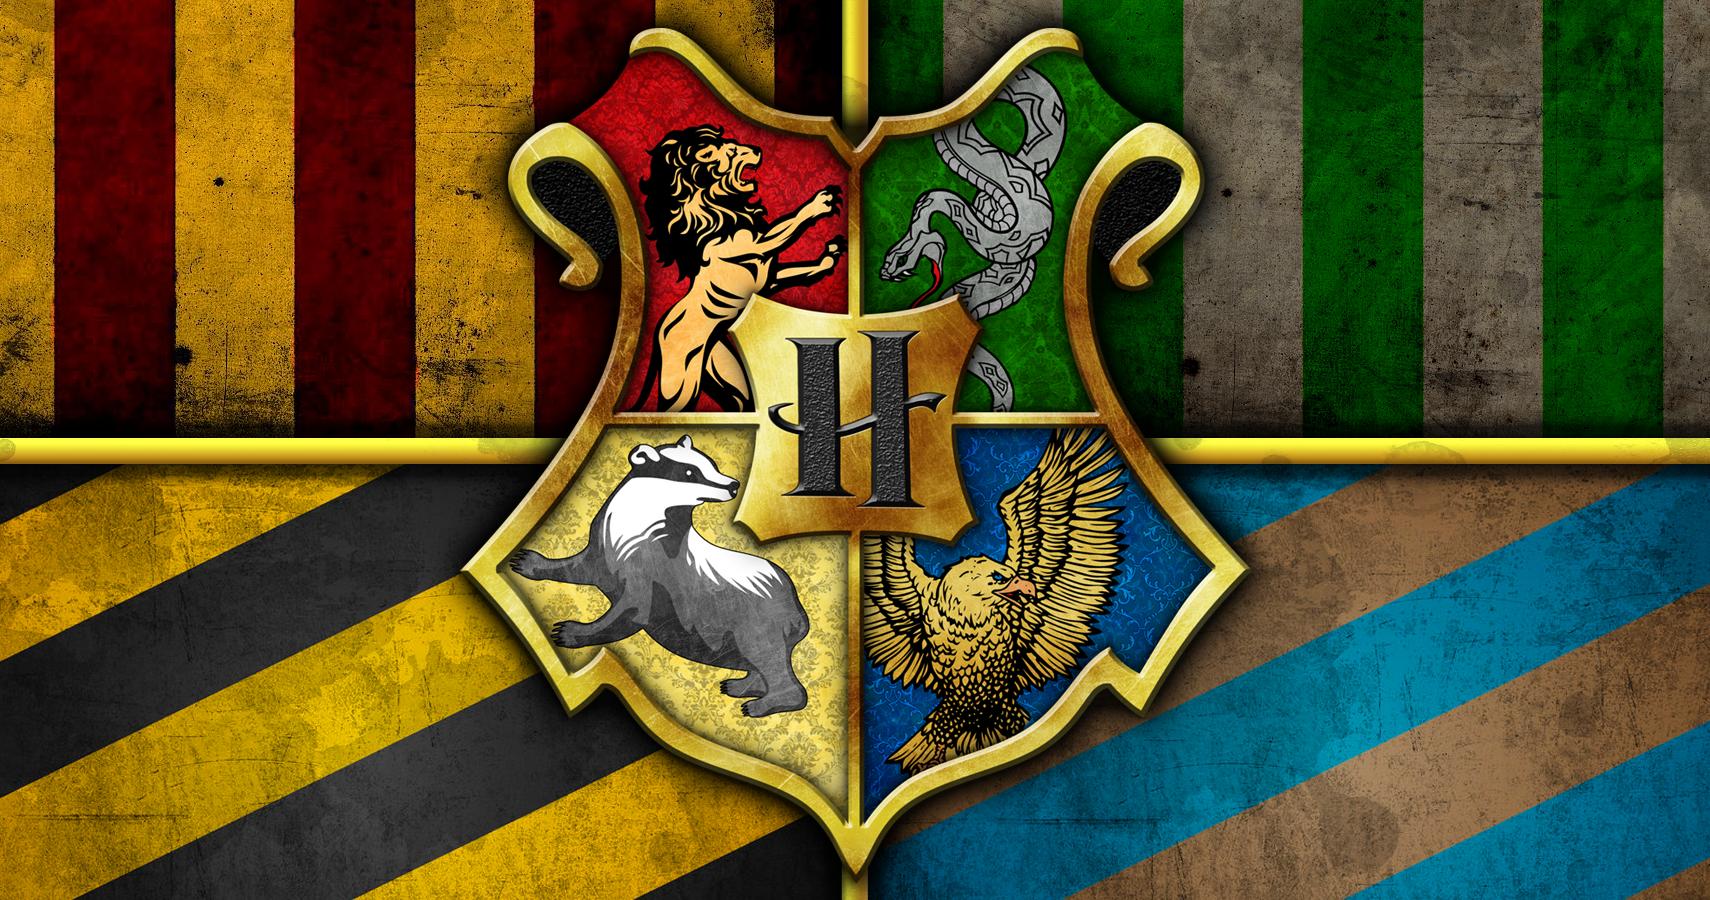 Harry Potter Hogwarts houses